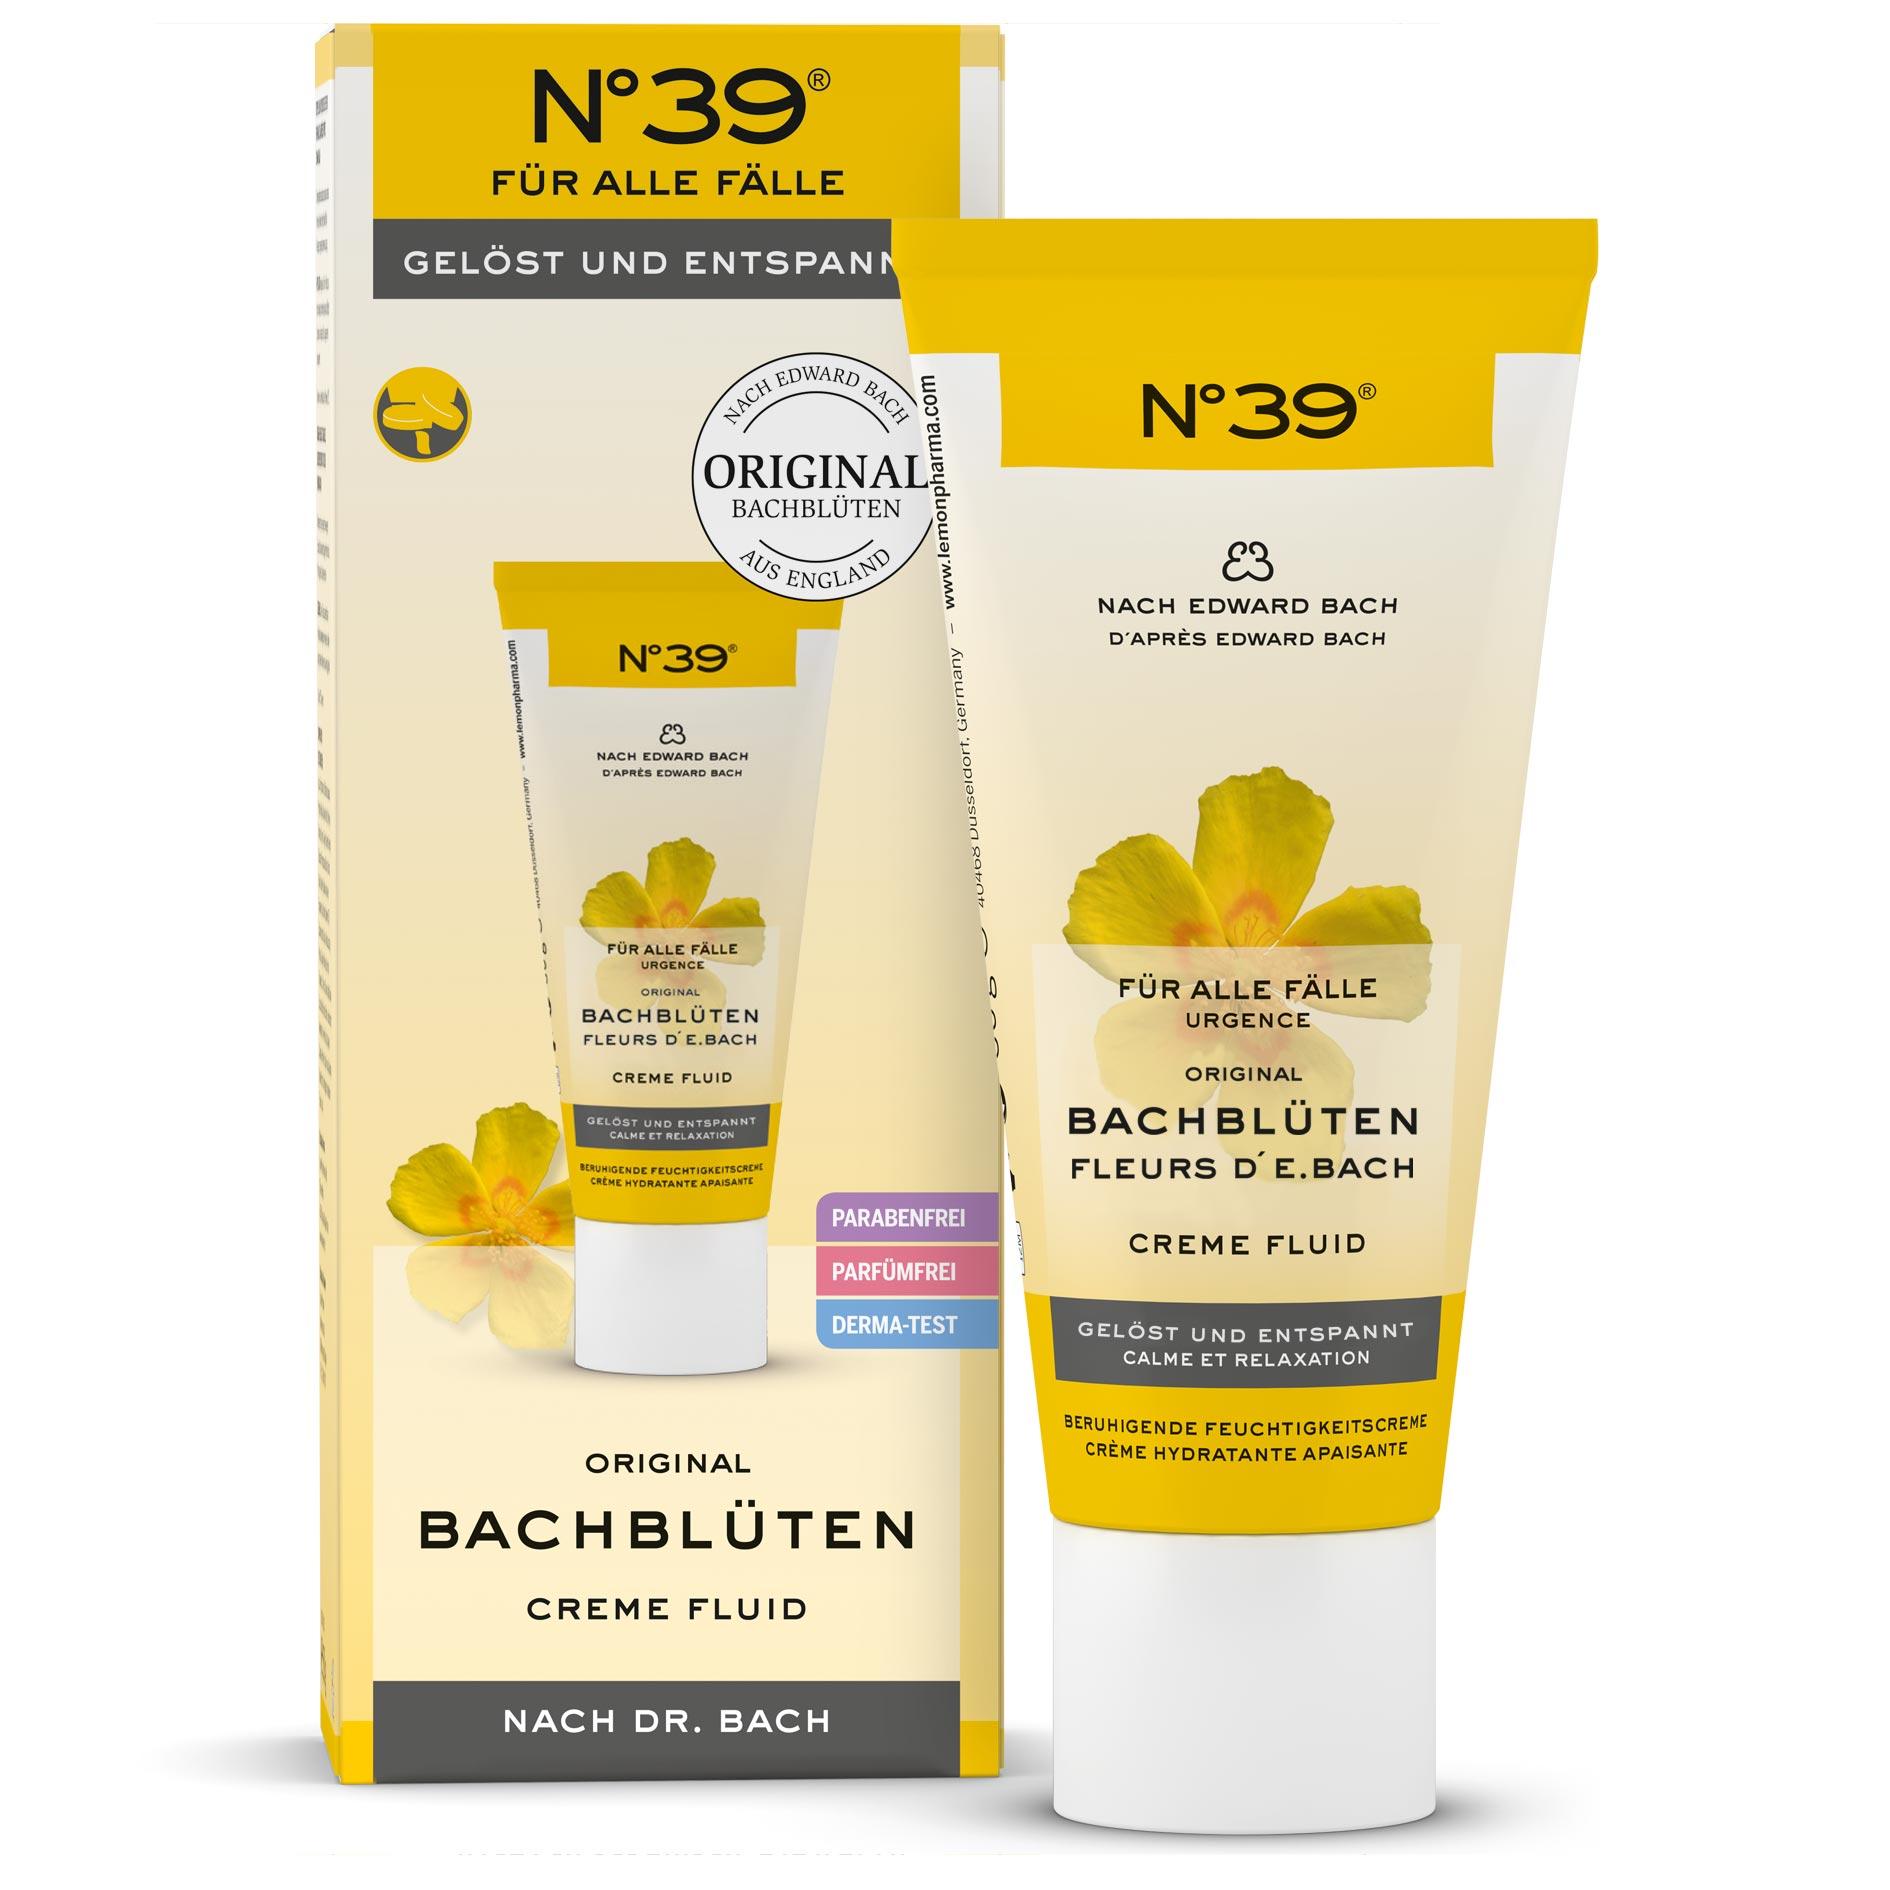 Crema fluida 39 Per tutti i casi Lemon Pharma